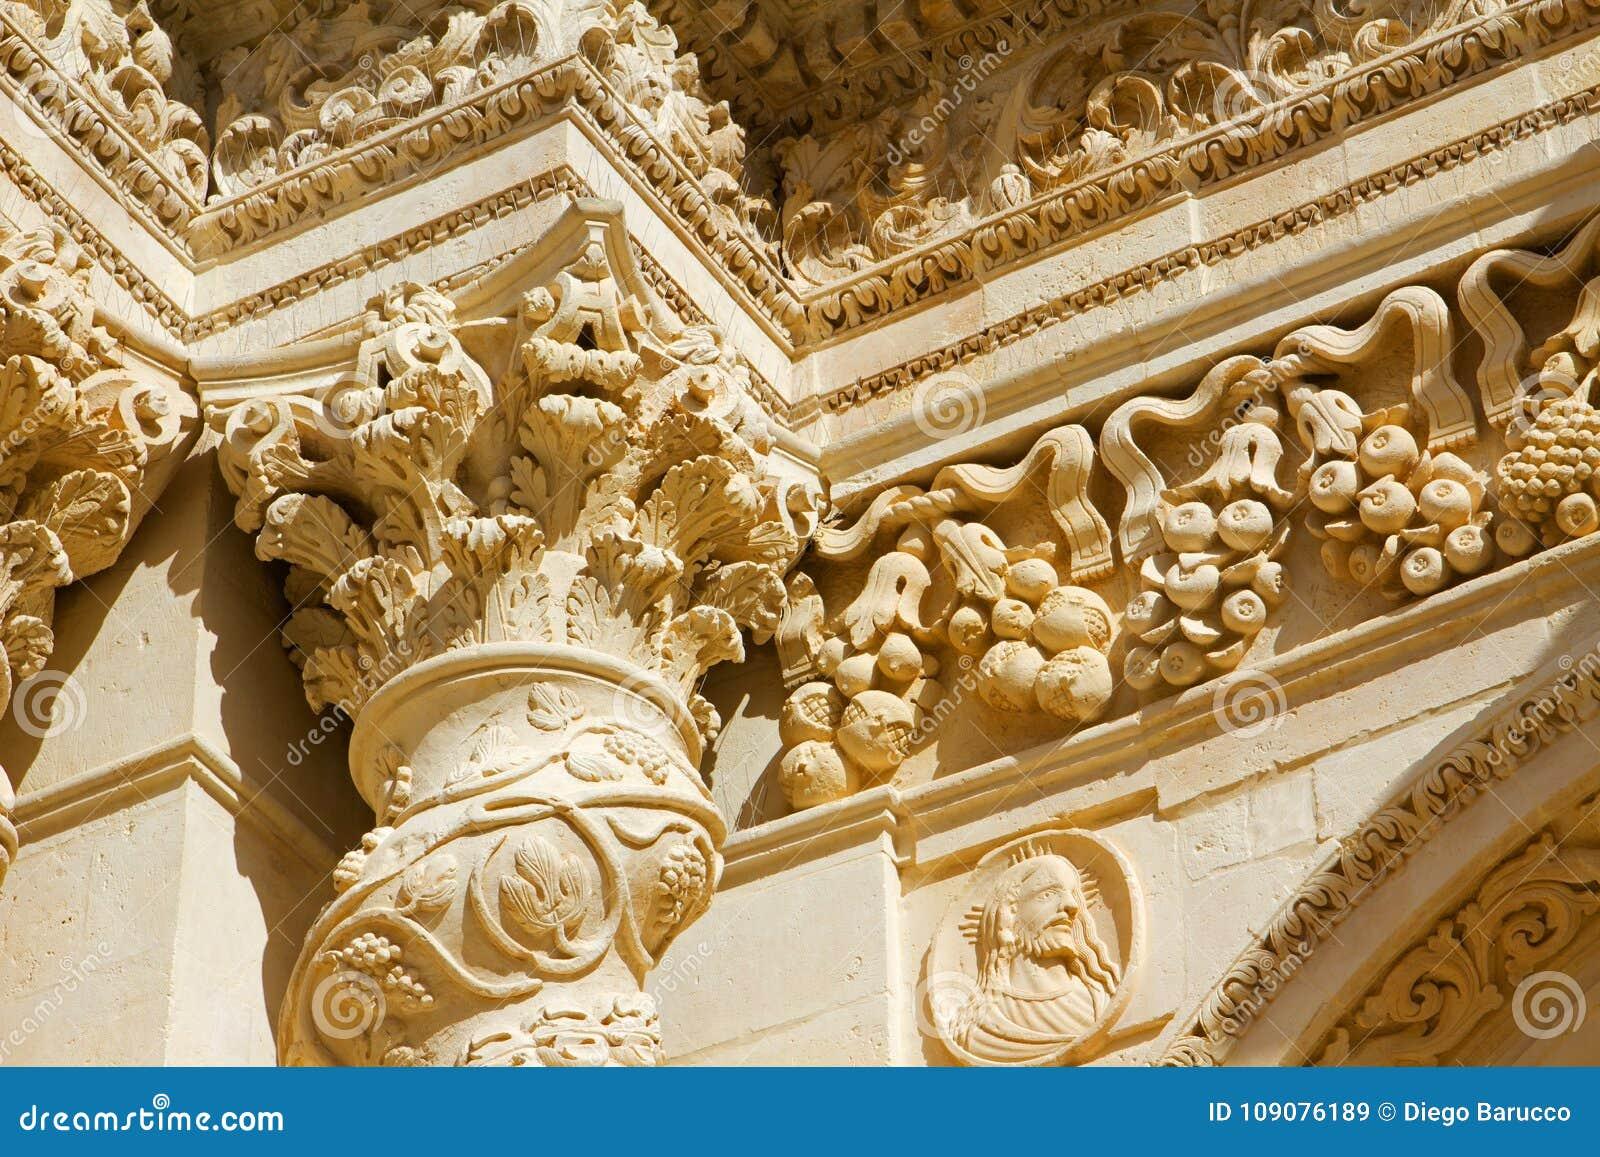 Details barok van kolom en kapitaal van de Siciliaanse Kerk